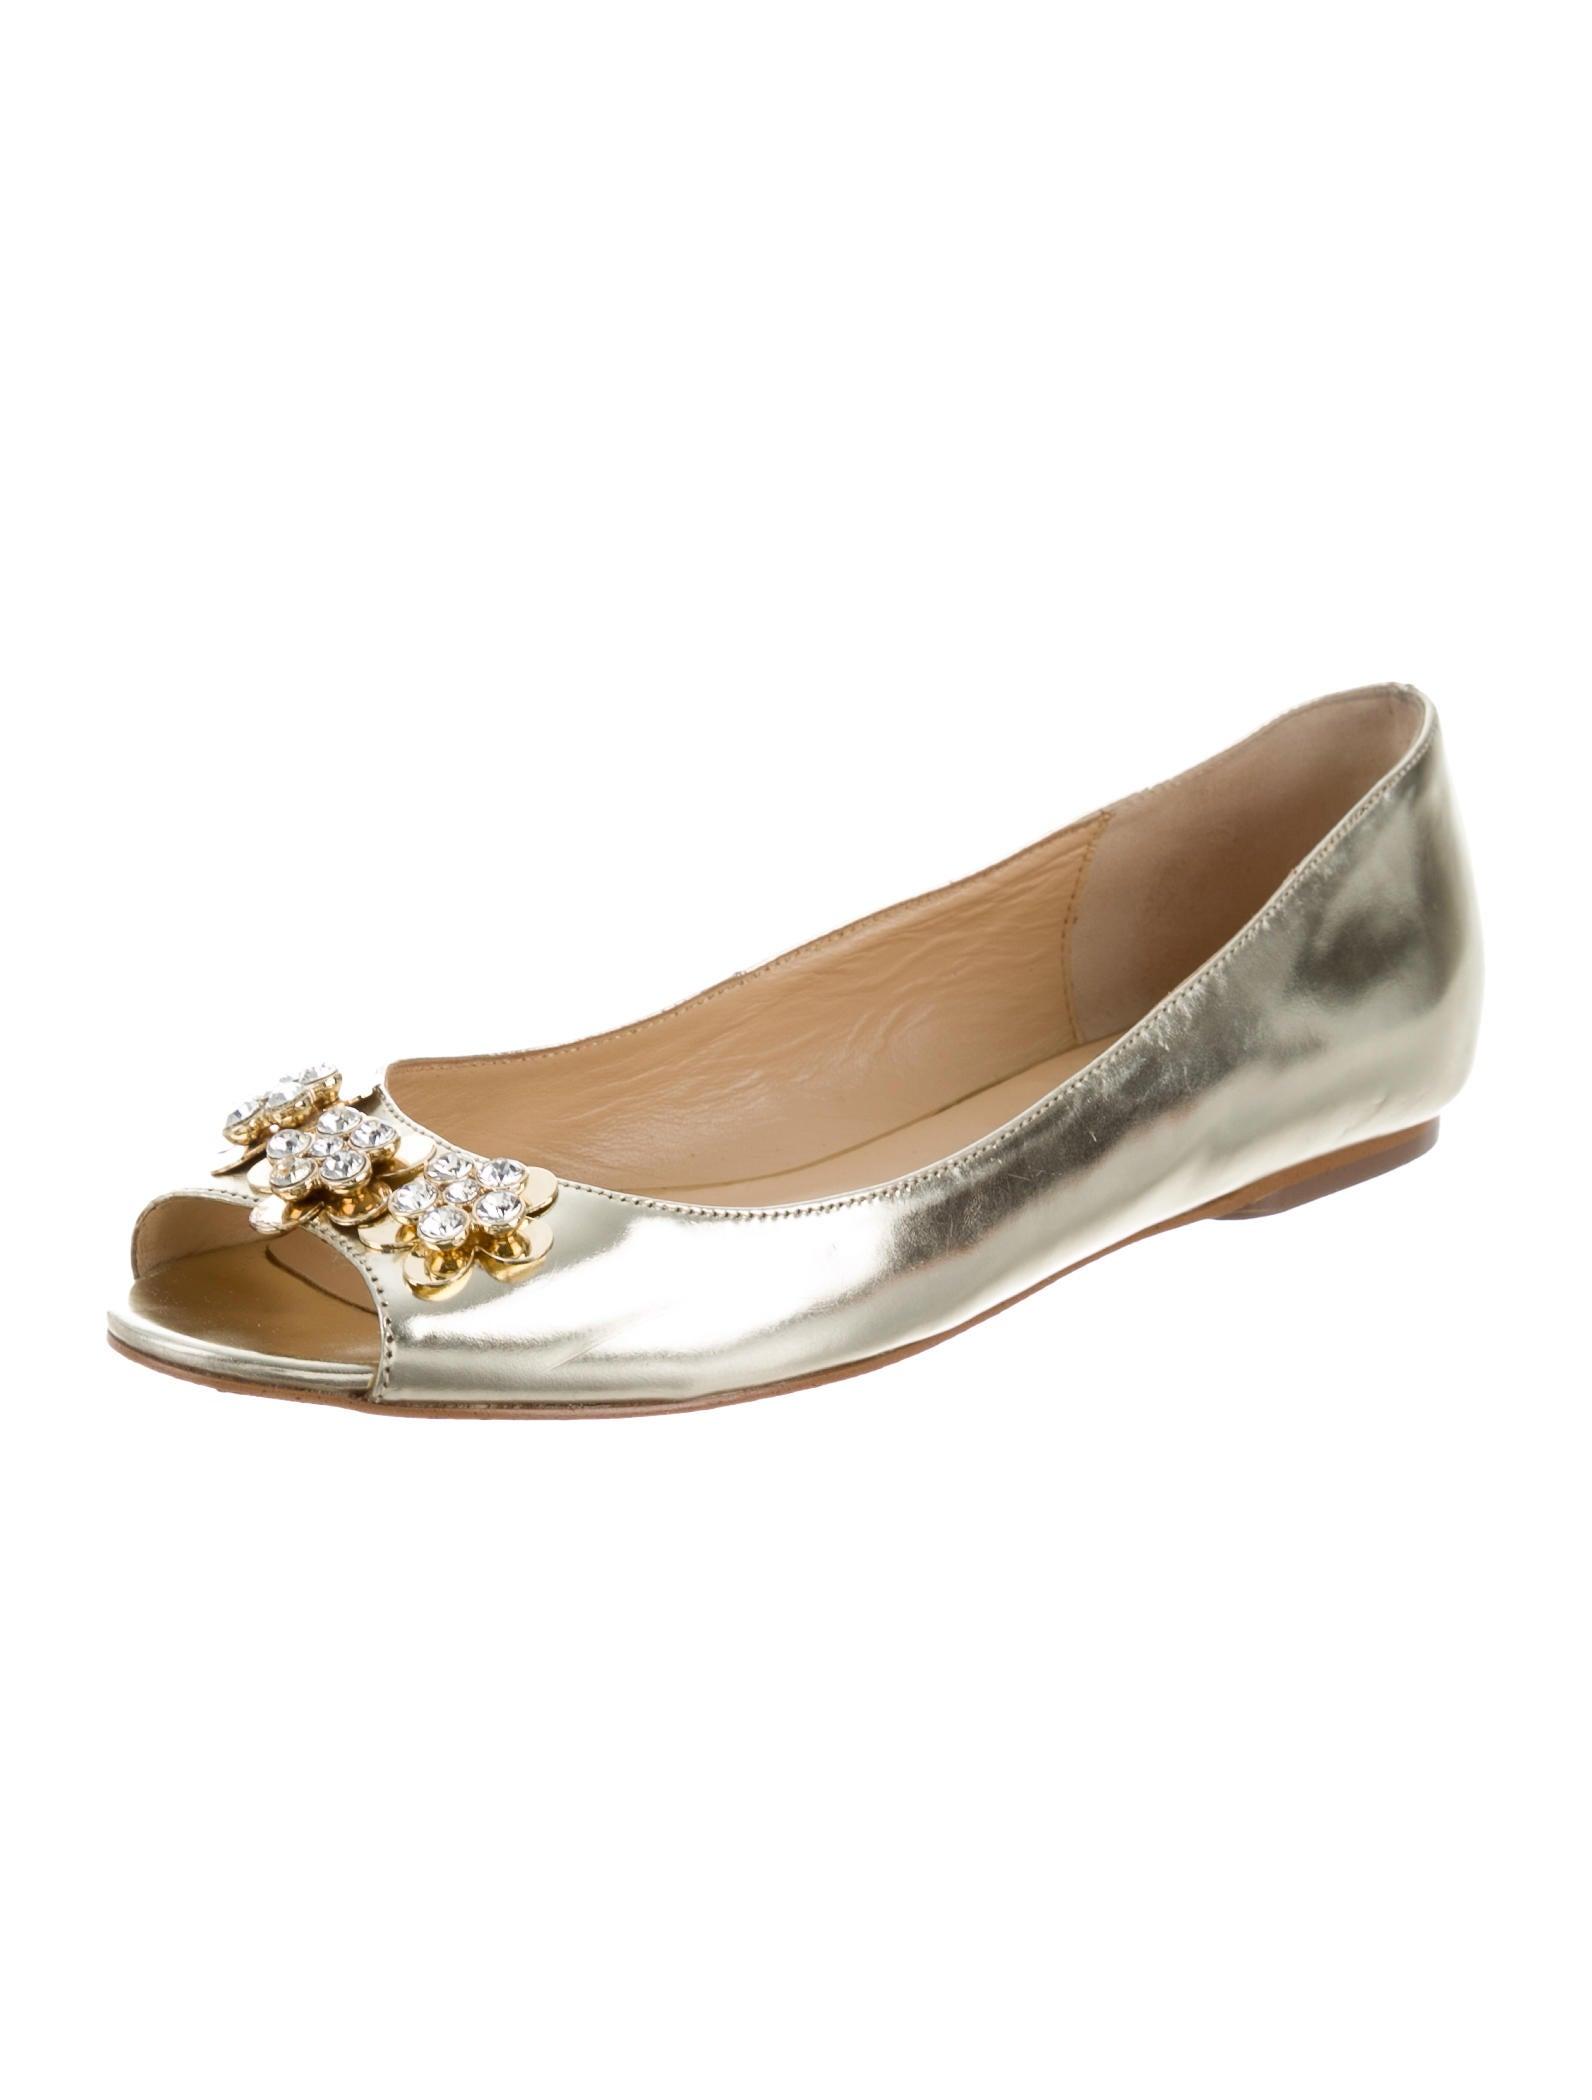 Kate spade new york floral peep toe flats shoes for Kate spade new york flats